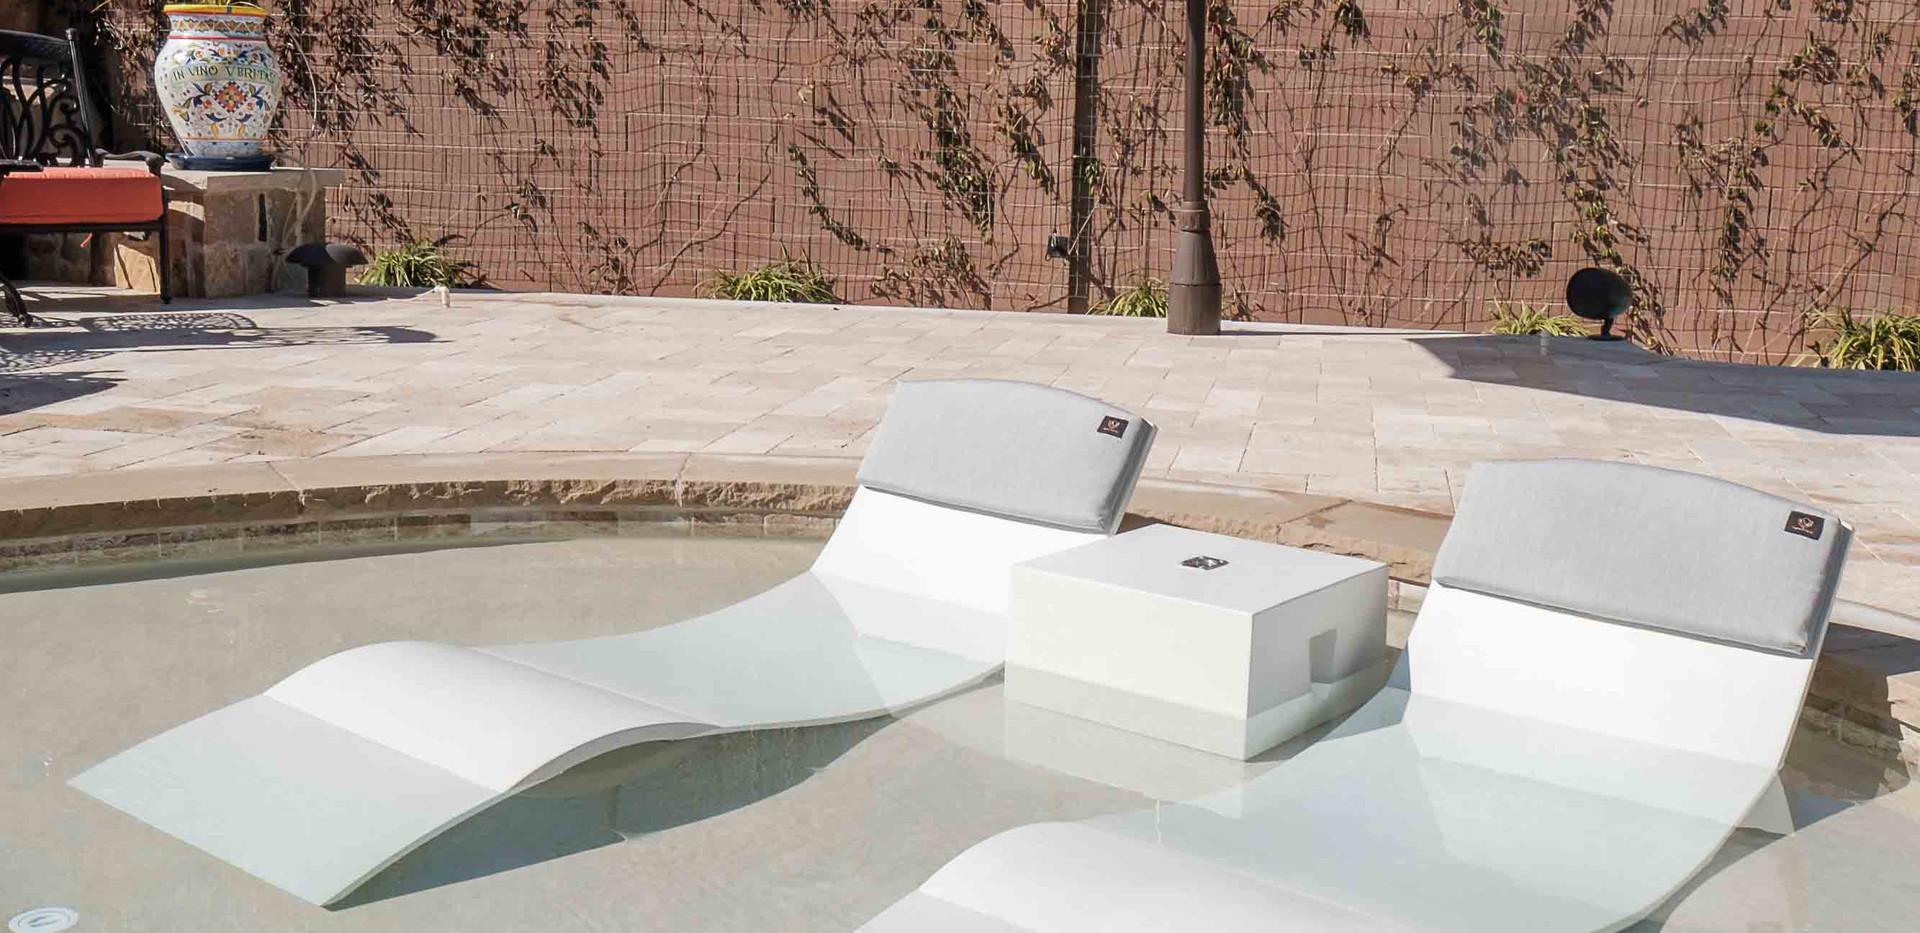 Pool Ledge Chair